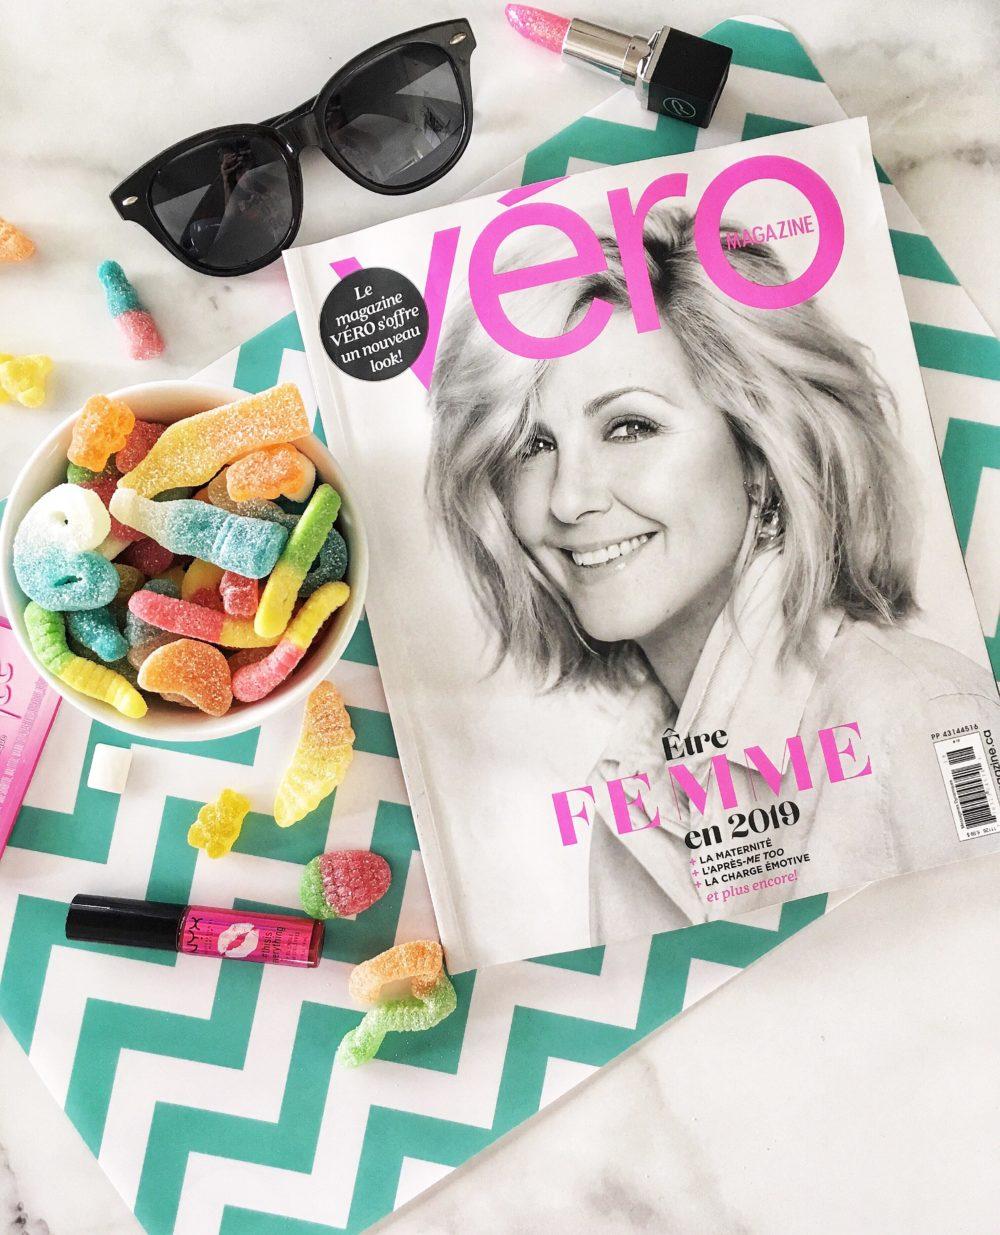 Chers magazines féminins